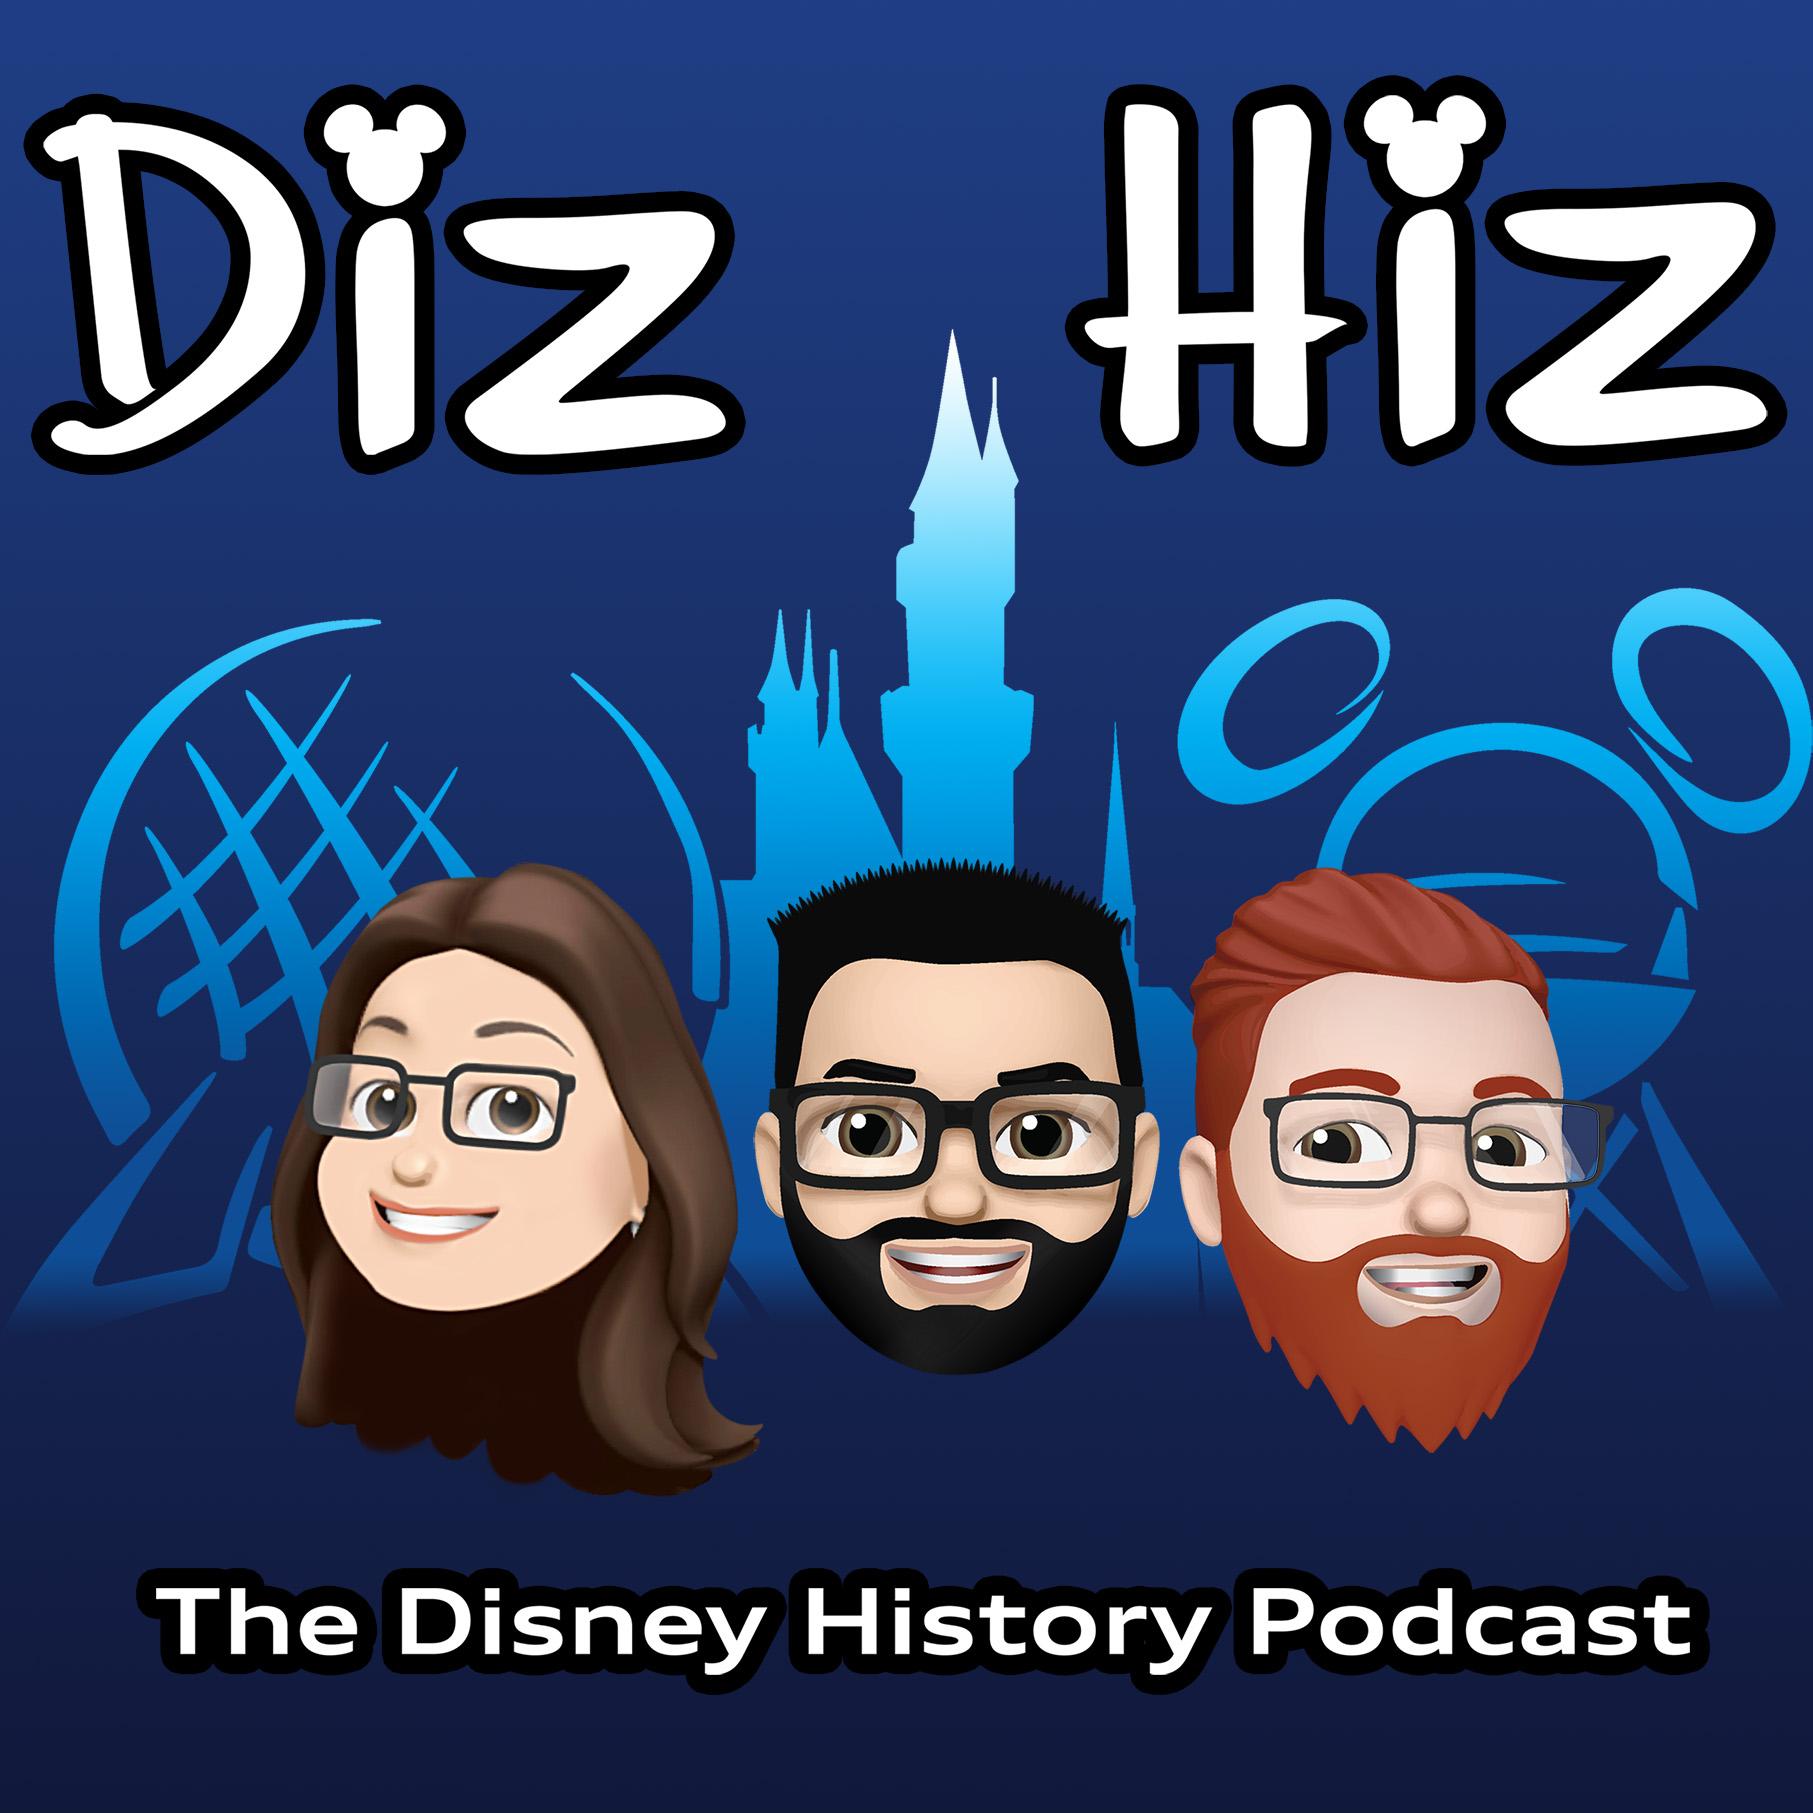 Diz Hiz: The Disney History Podcast (Follow Us on Social Media Diz Hiz 65) show art